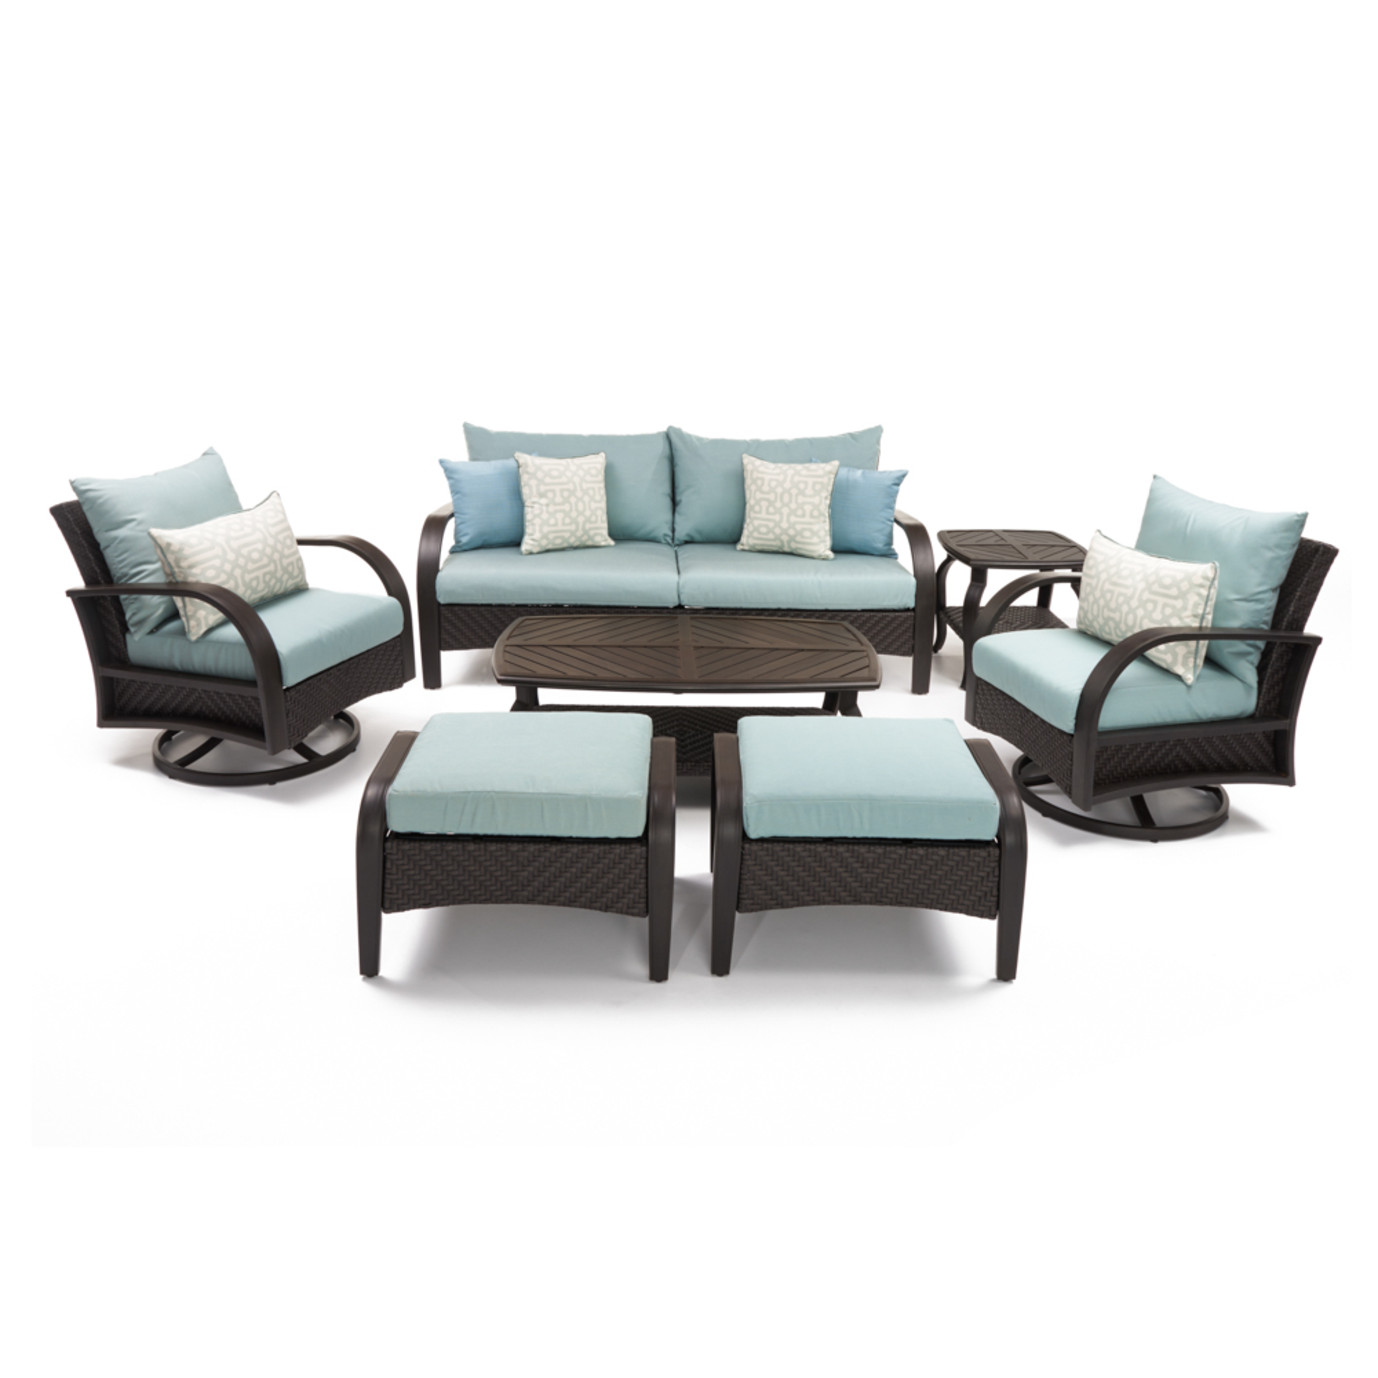 Barcelo™ 7pc Motion Club Deep Seating Set -Spa Blue